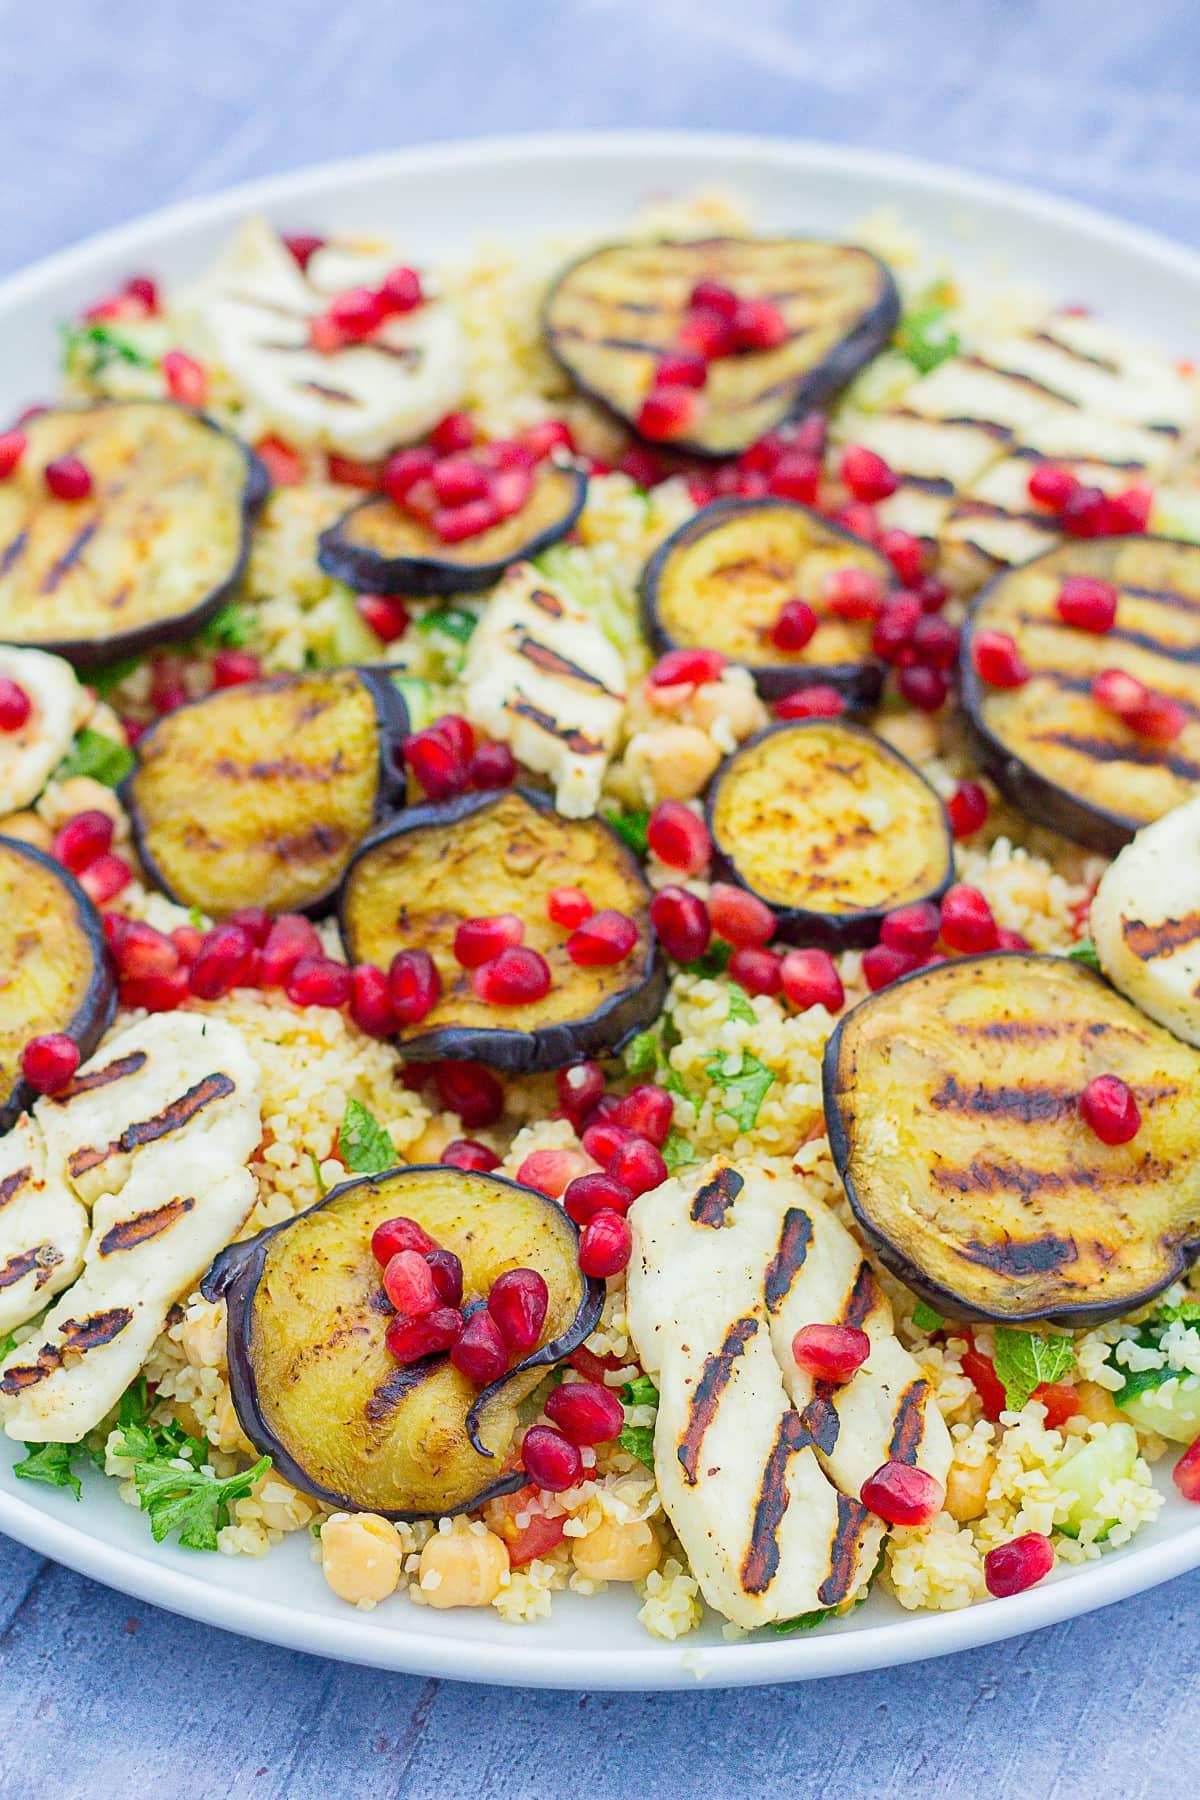 Aubergine and Halloumi Salad on a large serving platter